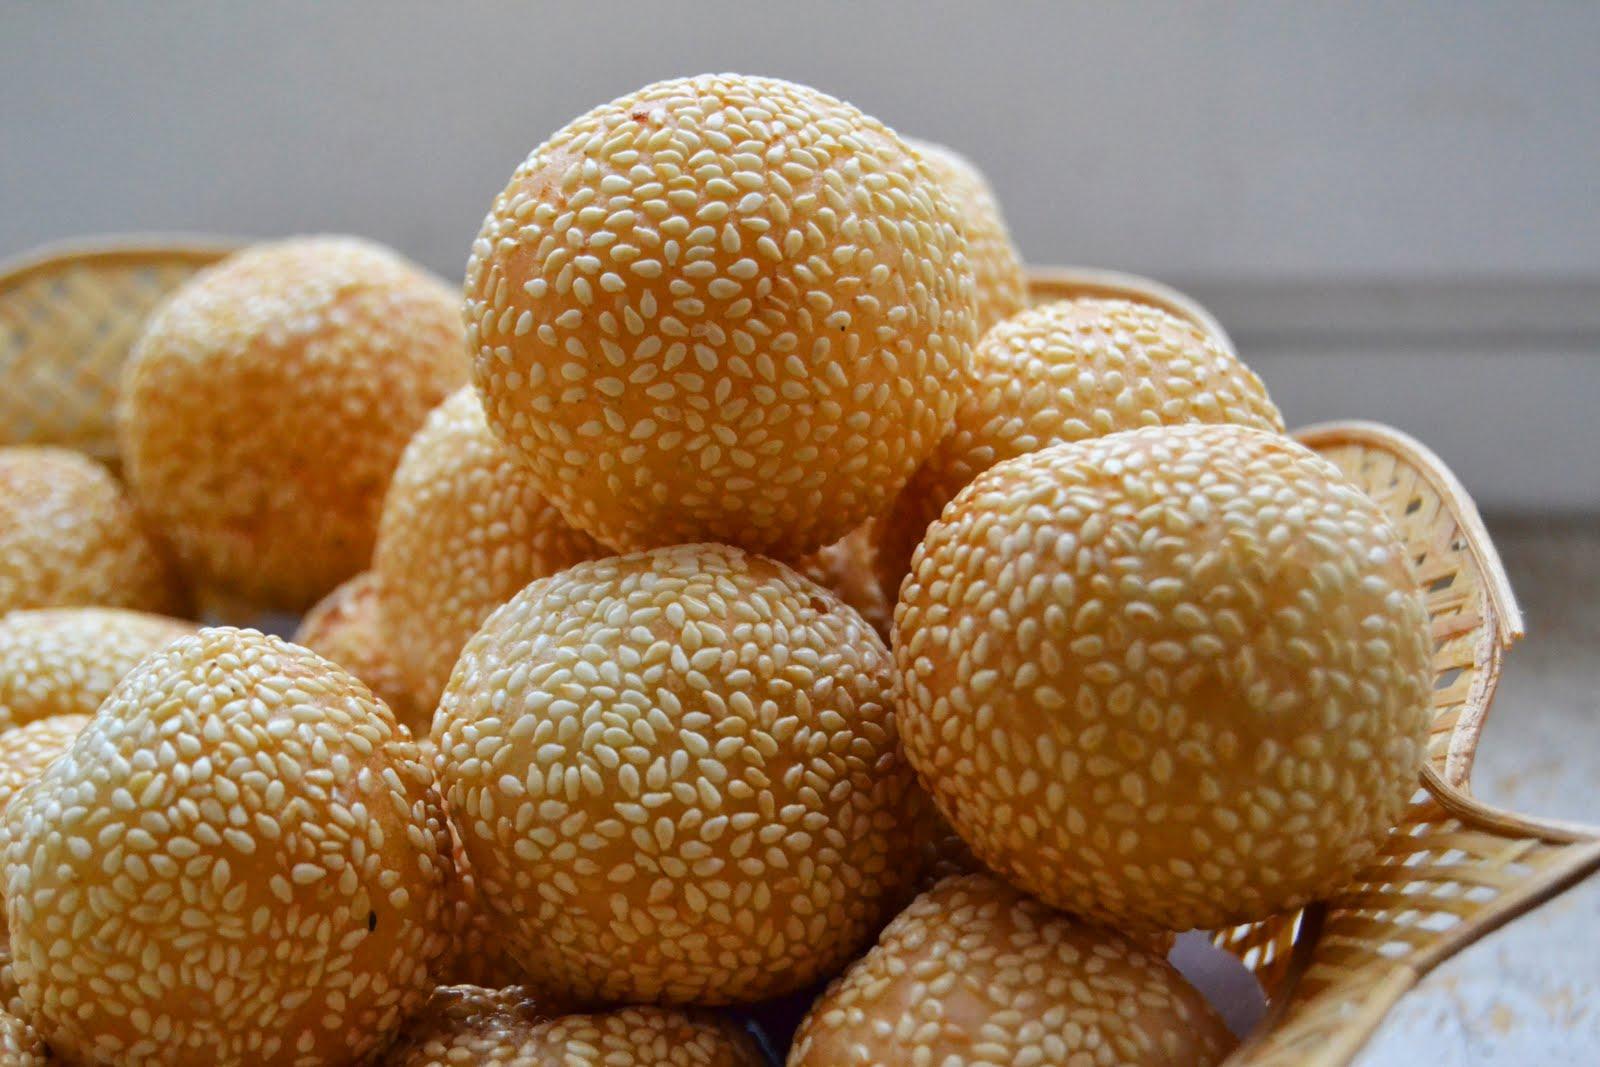 Resep Kue Basah|Resep Onde-Onde Kacang Merah